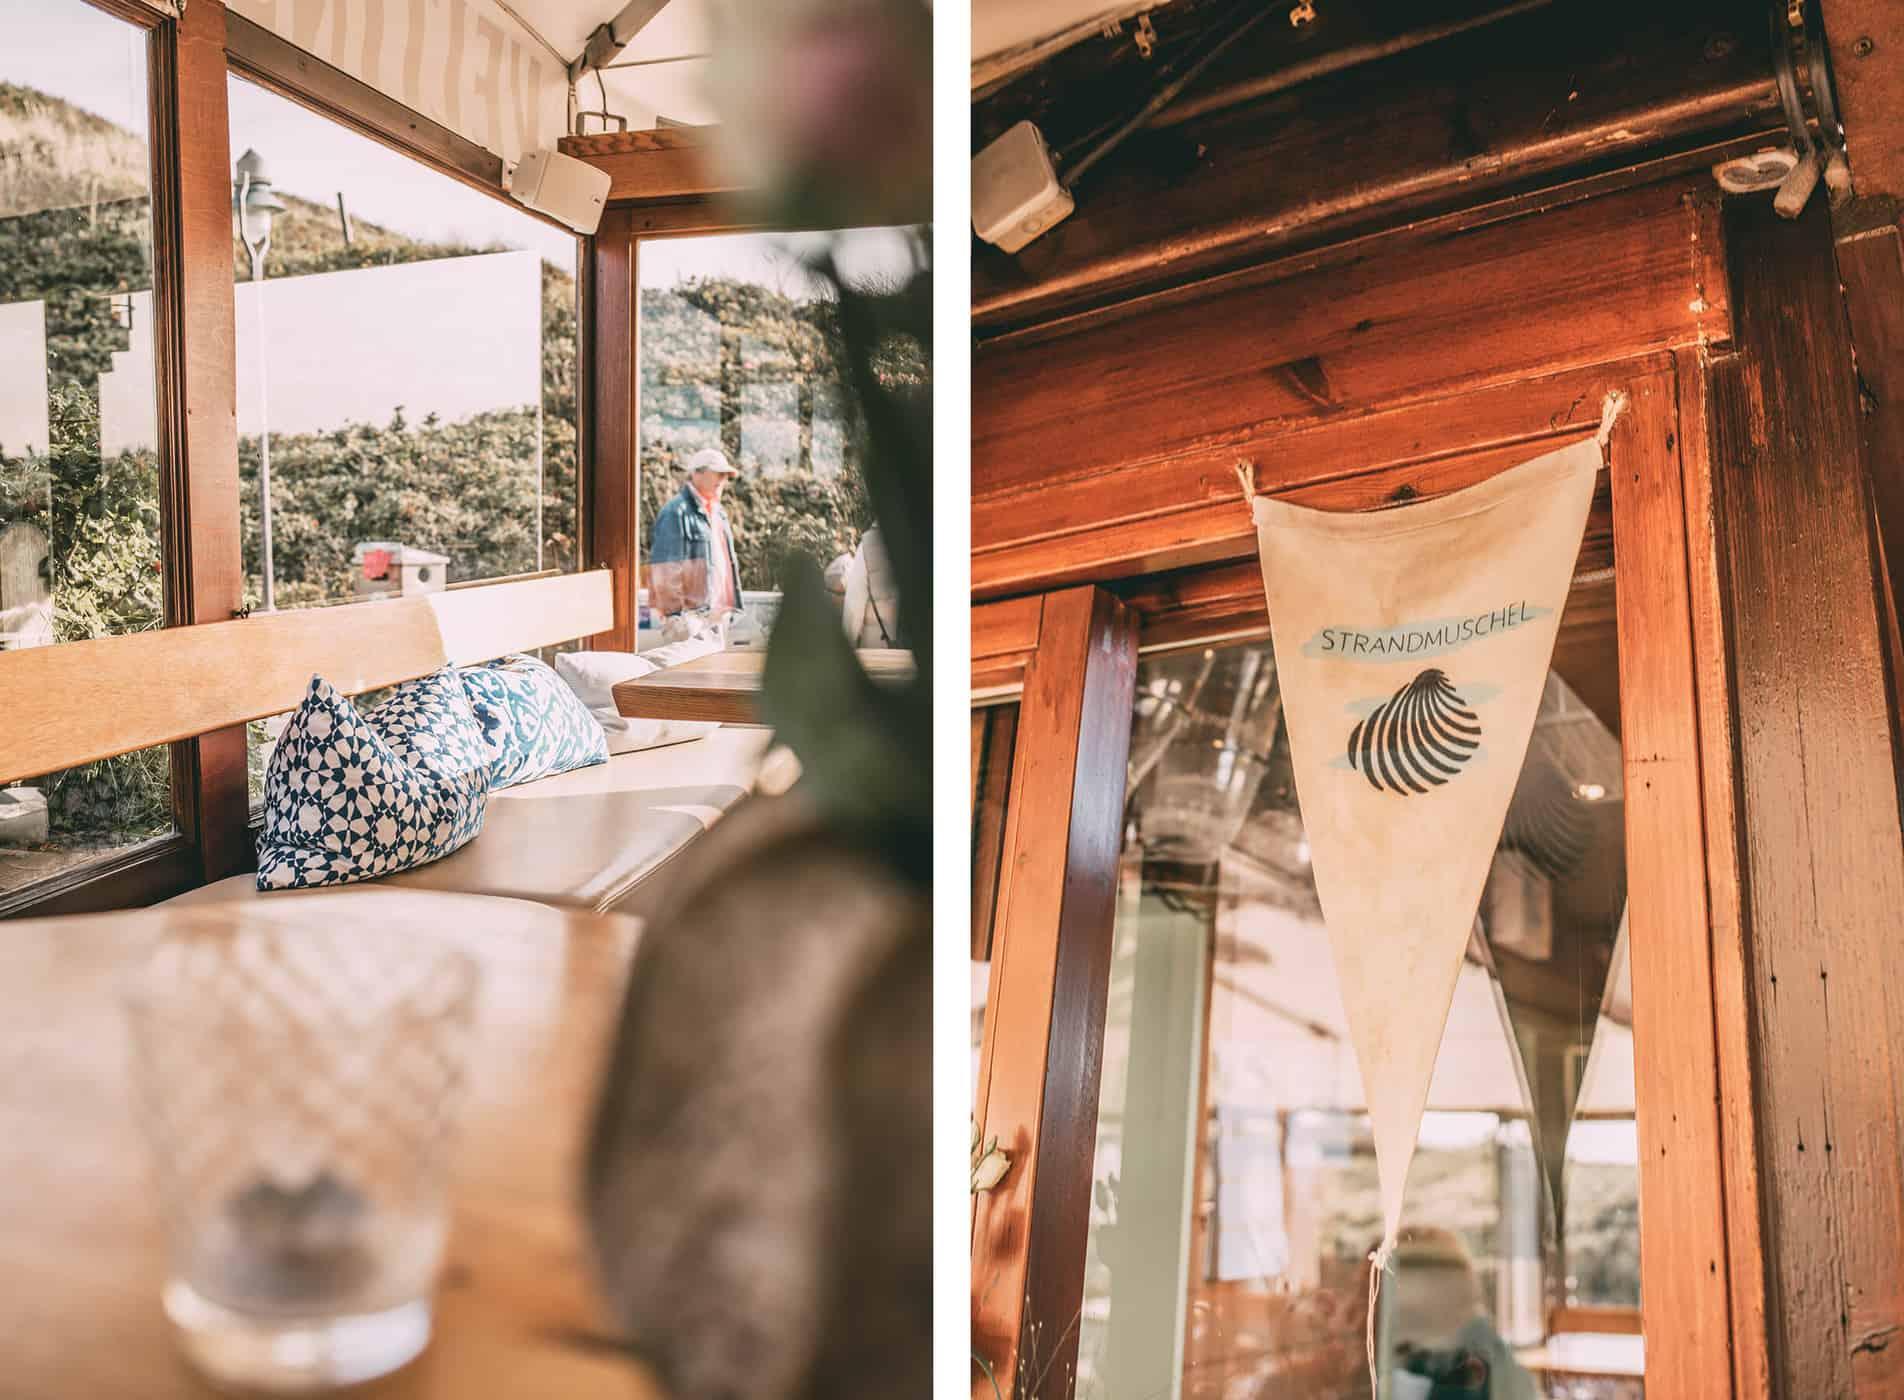 Strandmuschel Rantum Restaurant am Hauptstrand